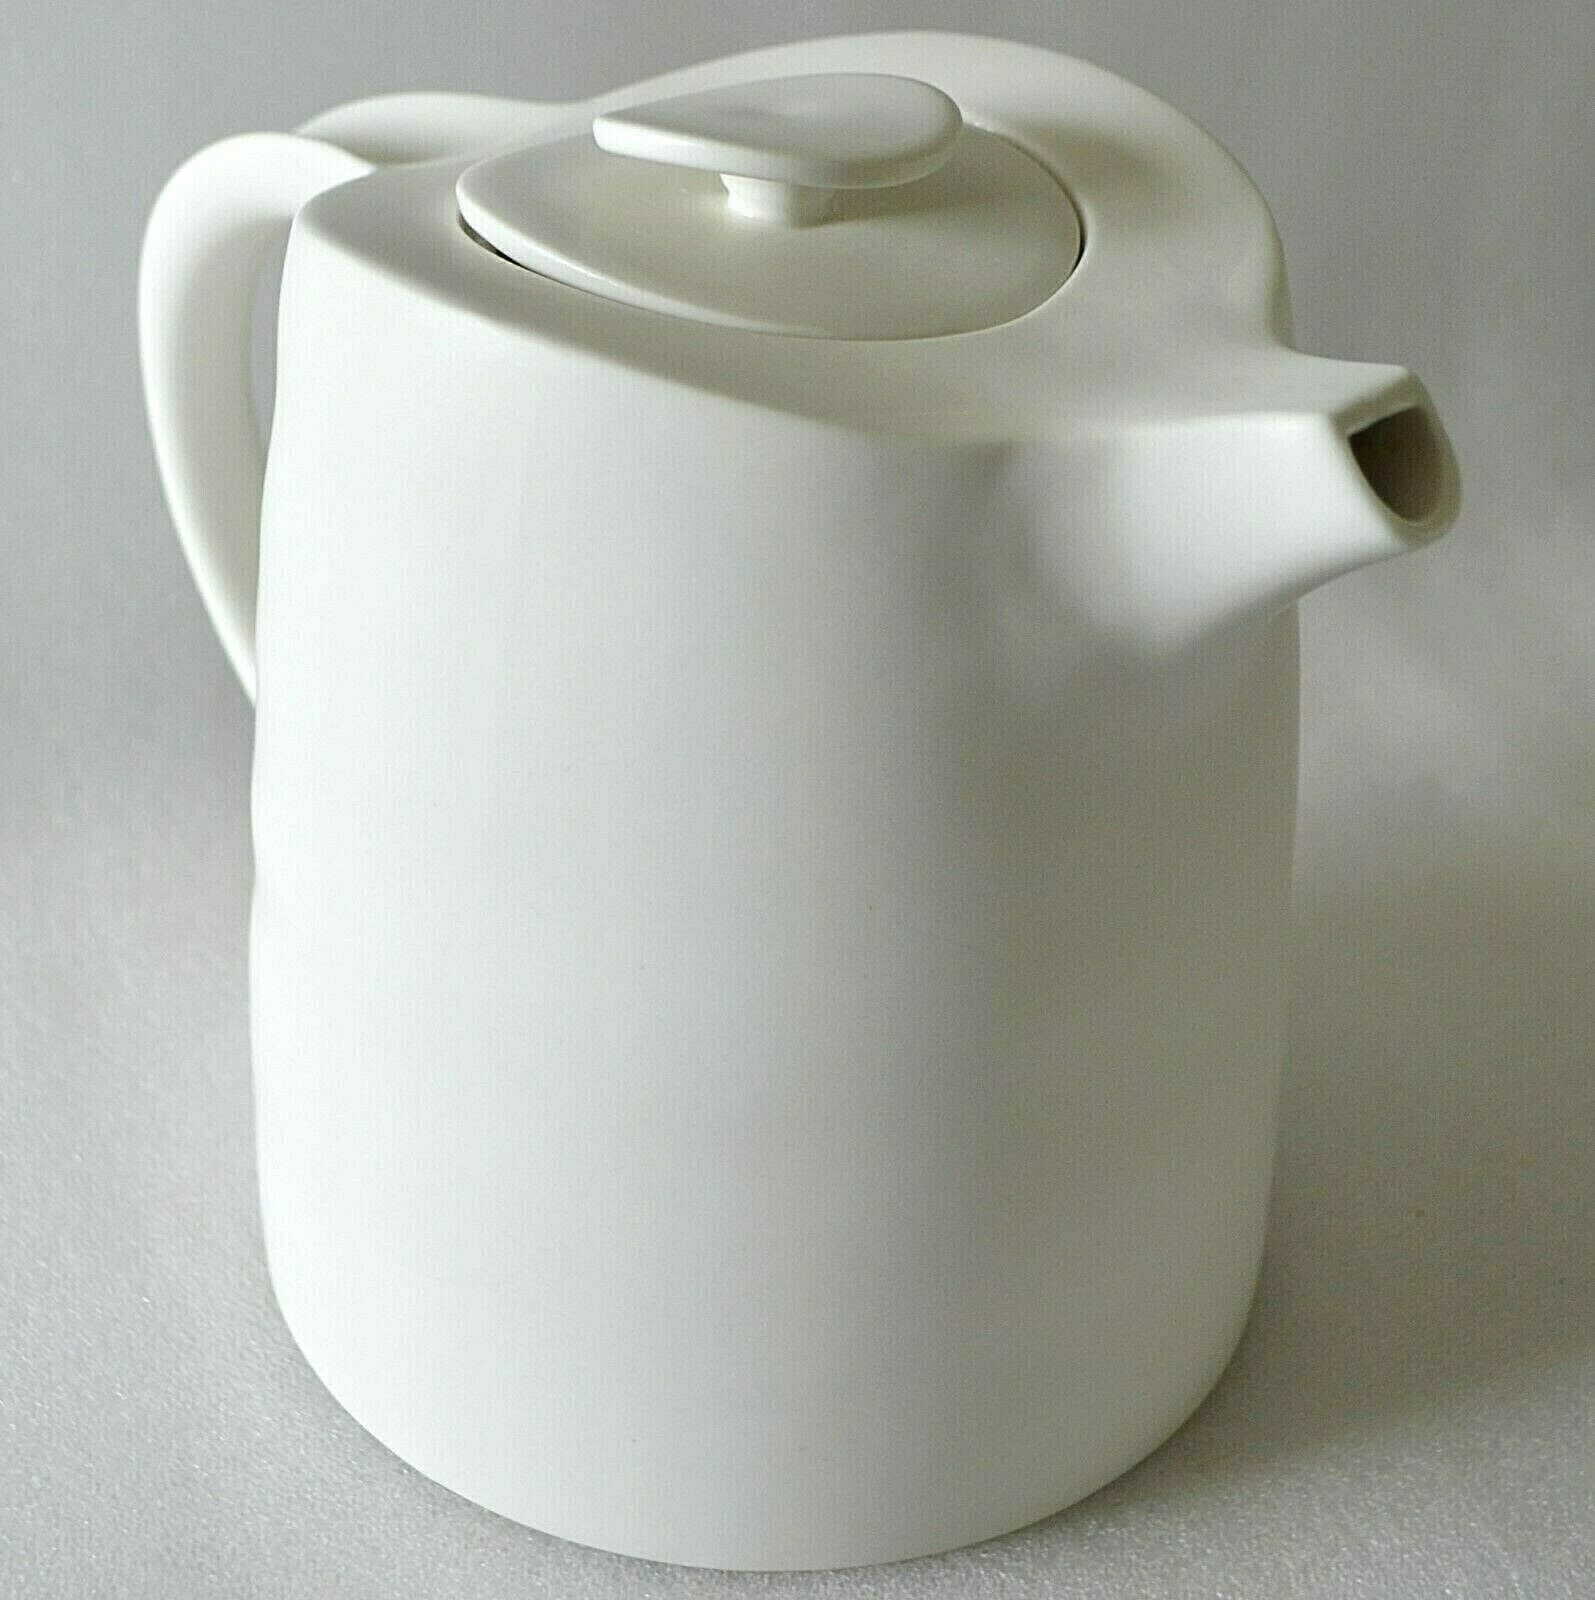 3,co Ripple Teapot blanc Matte Handmade Porcelain Tea Pot Modern Minimalist 3CO